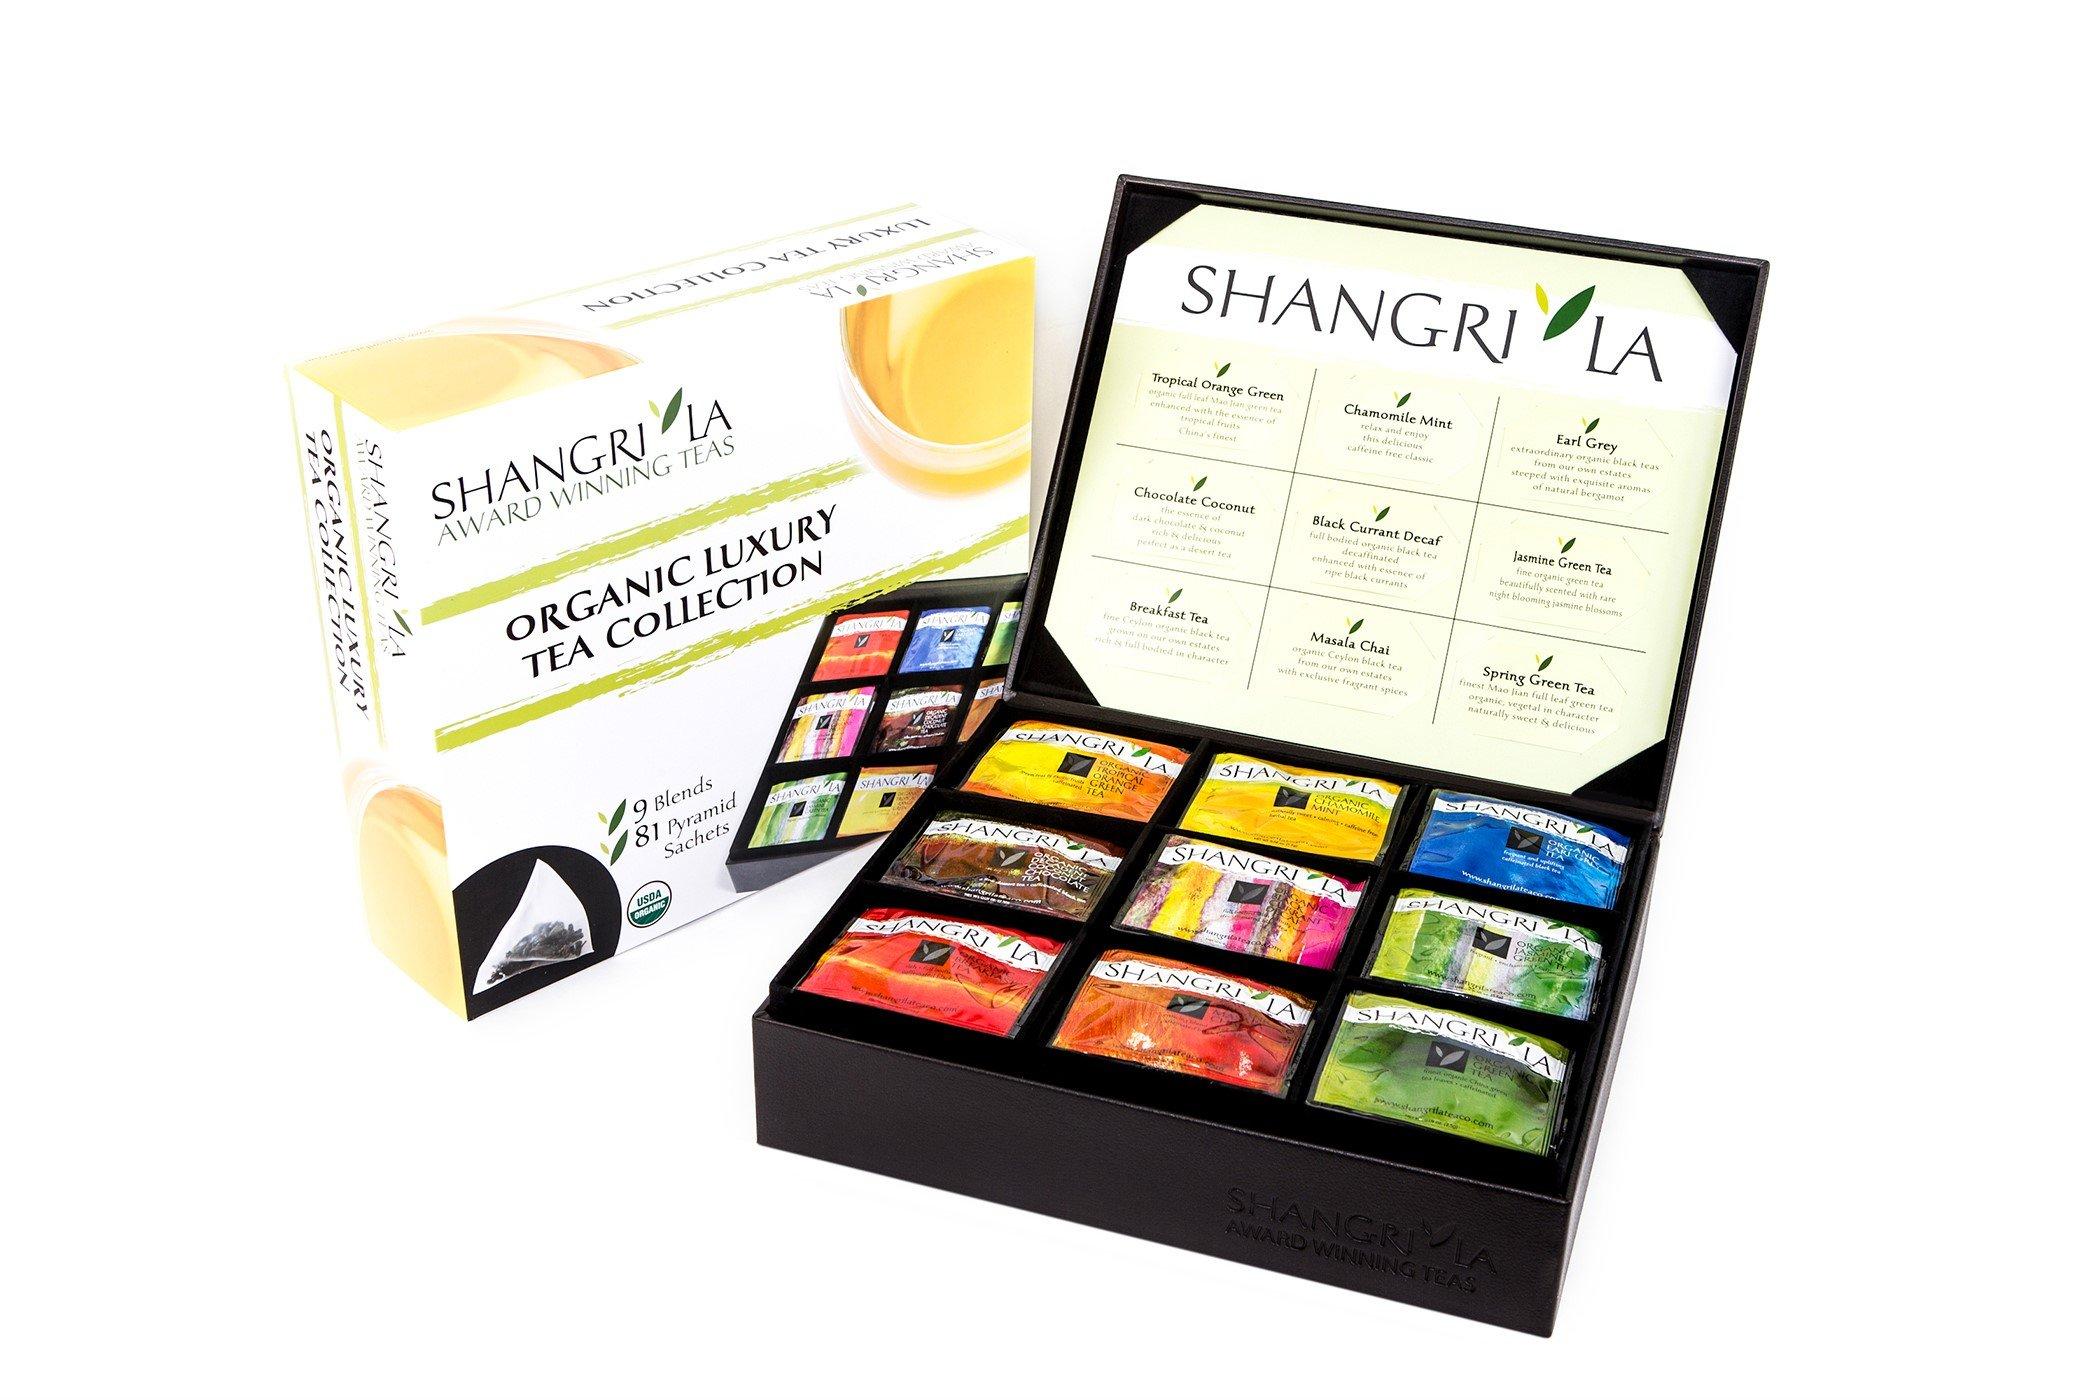 Shangri-La Tea Company Organic Luxury Silken Tea Sachet Collection, 81 Hot Tea Bags, 9 Different Flavors, Custom Gift Box